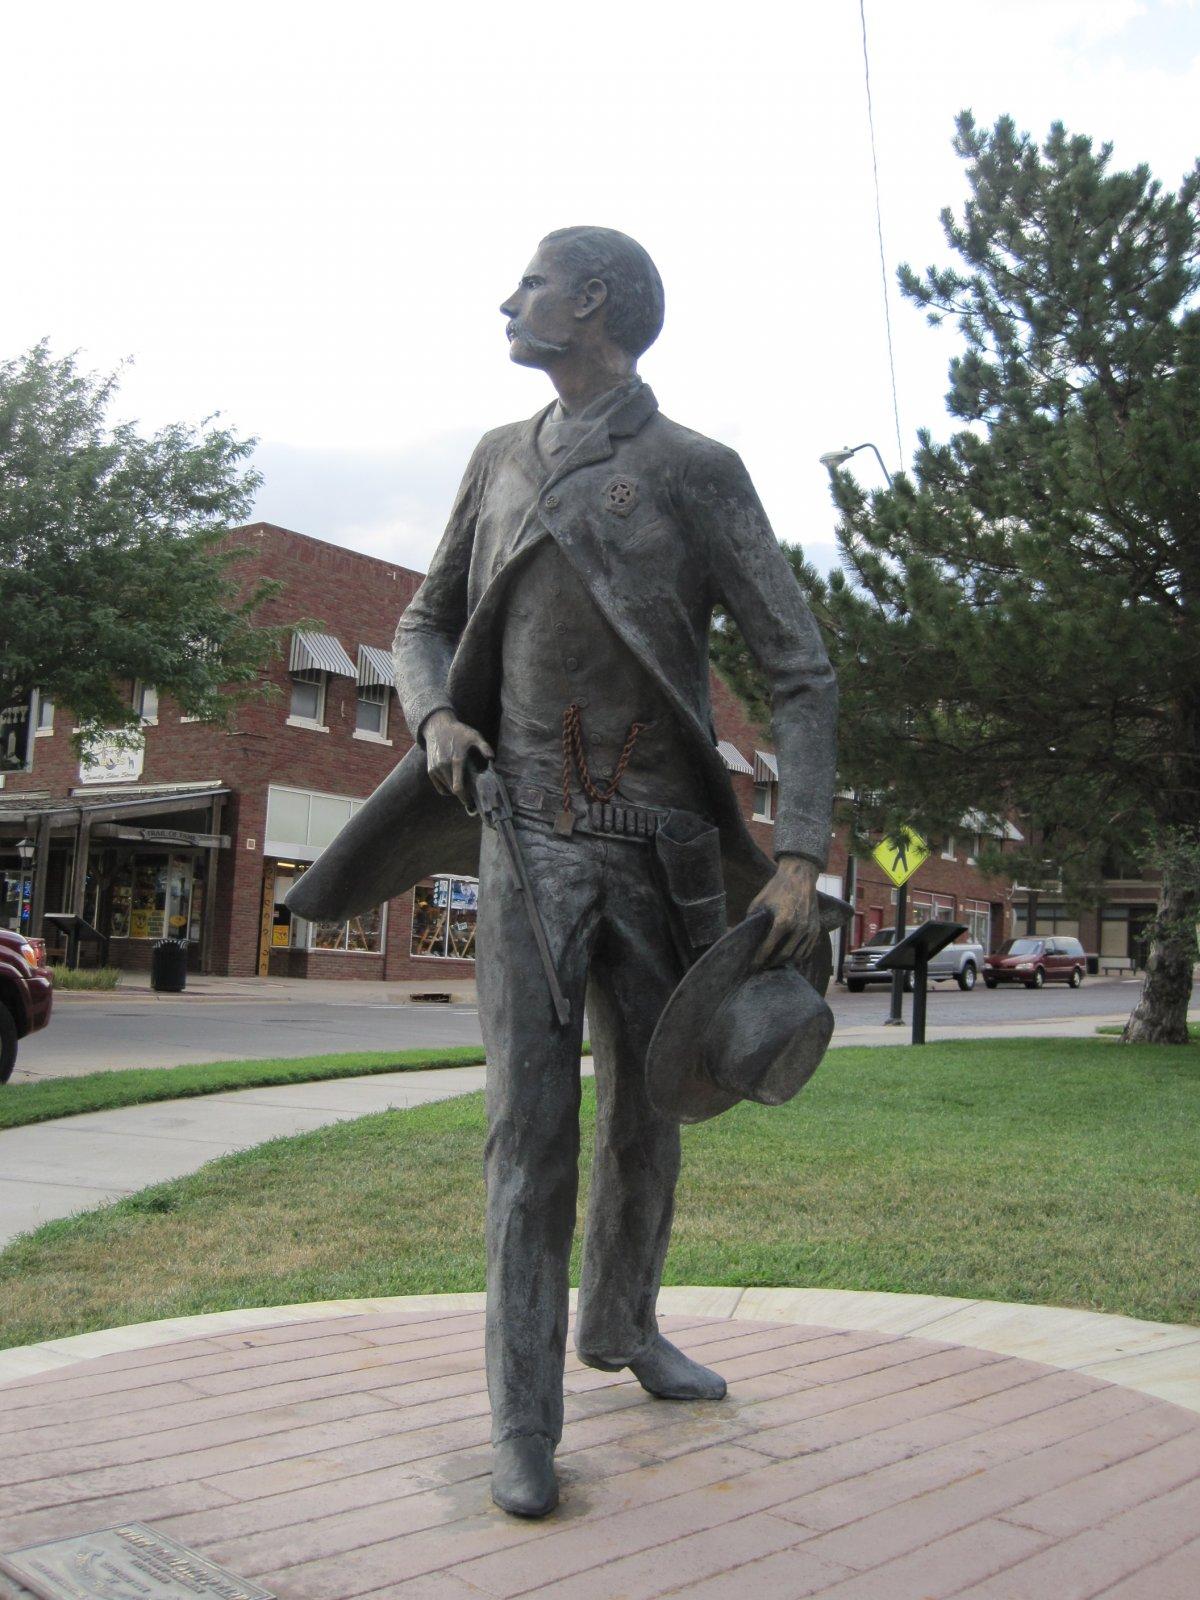 Click image for larger version  Name:July 15, 2011 W Colorado, Dodge City, KS 071.jpg Views:80 Size:301.0 KB ID:135090